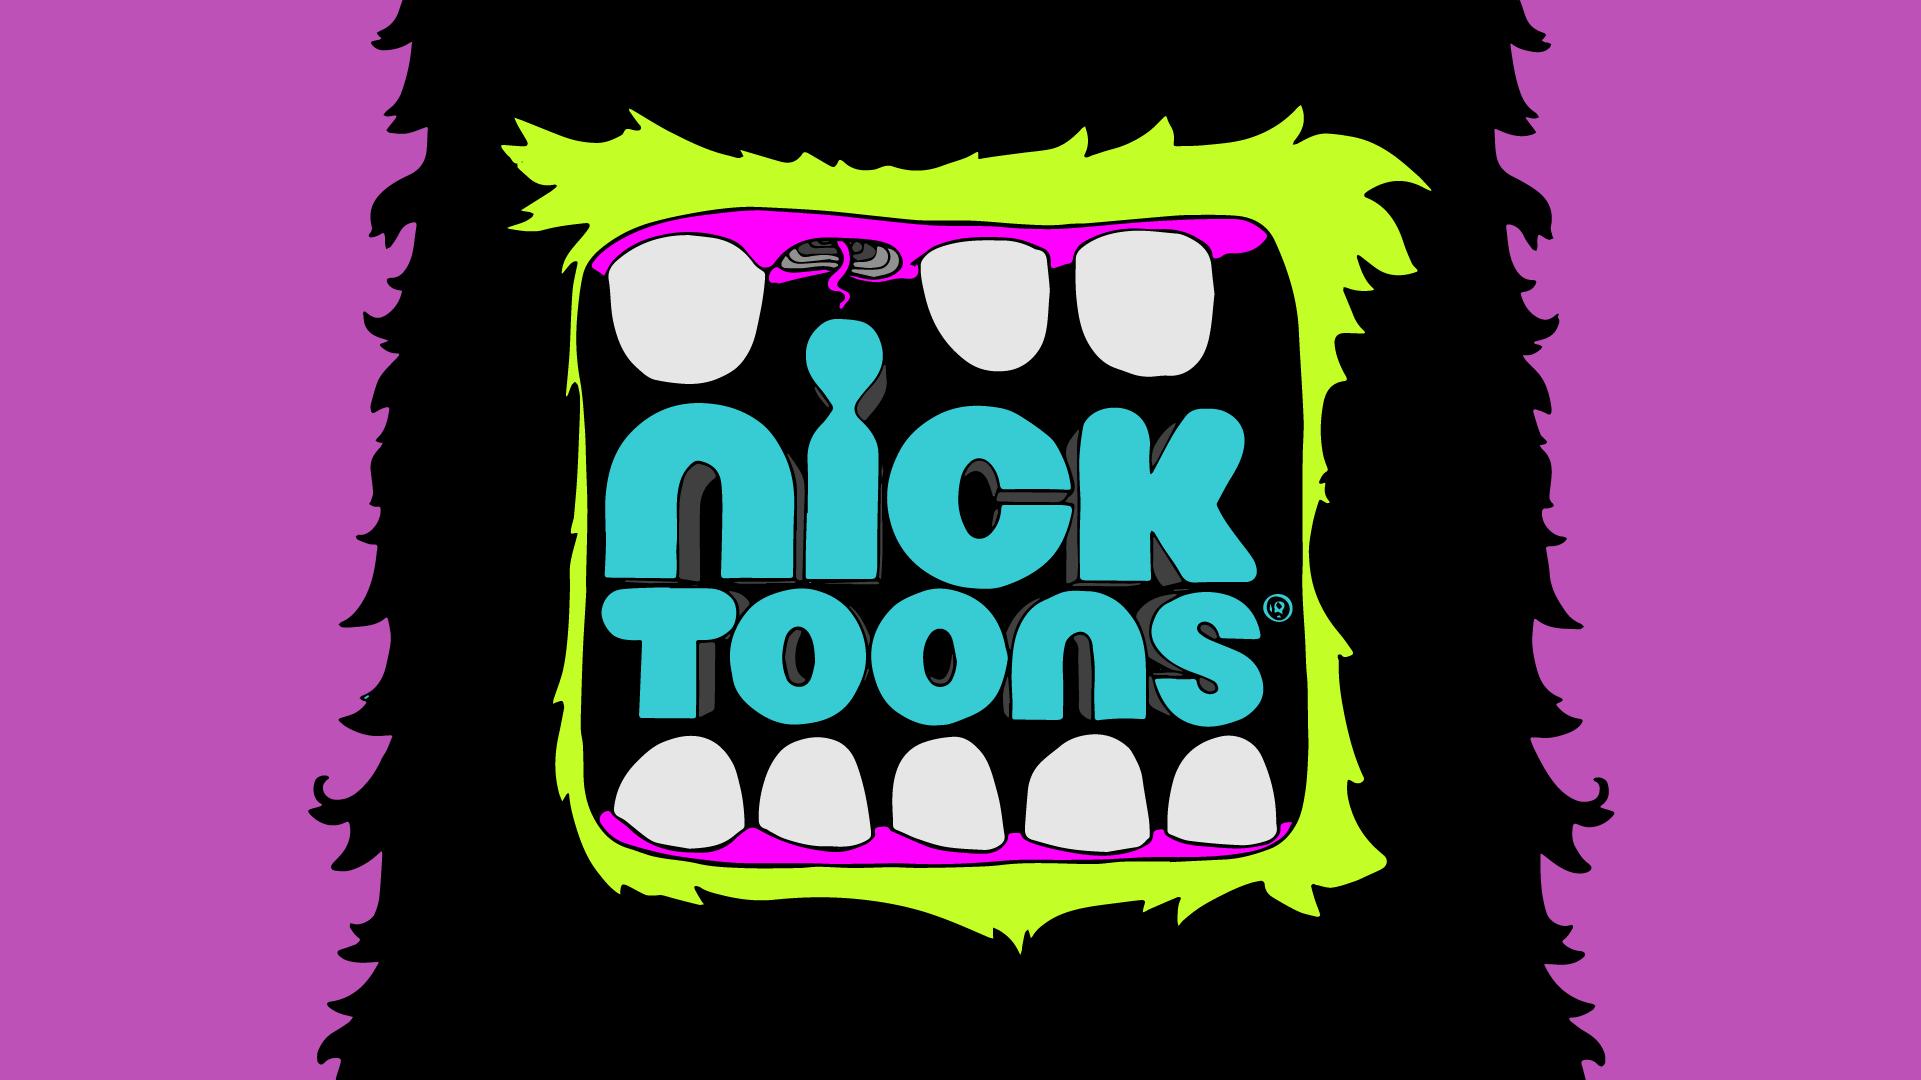 Nicktoons_ID_Yeti_01.png